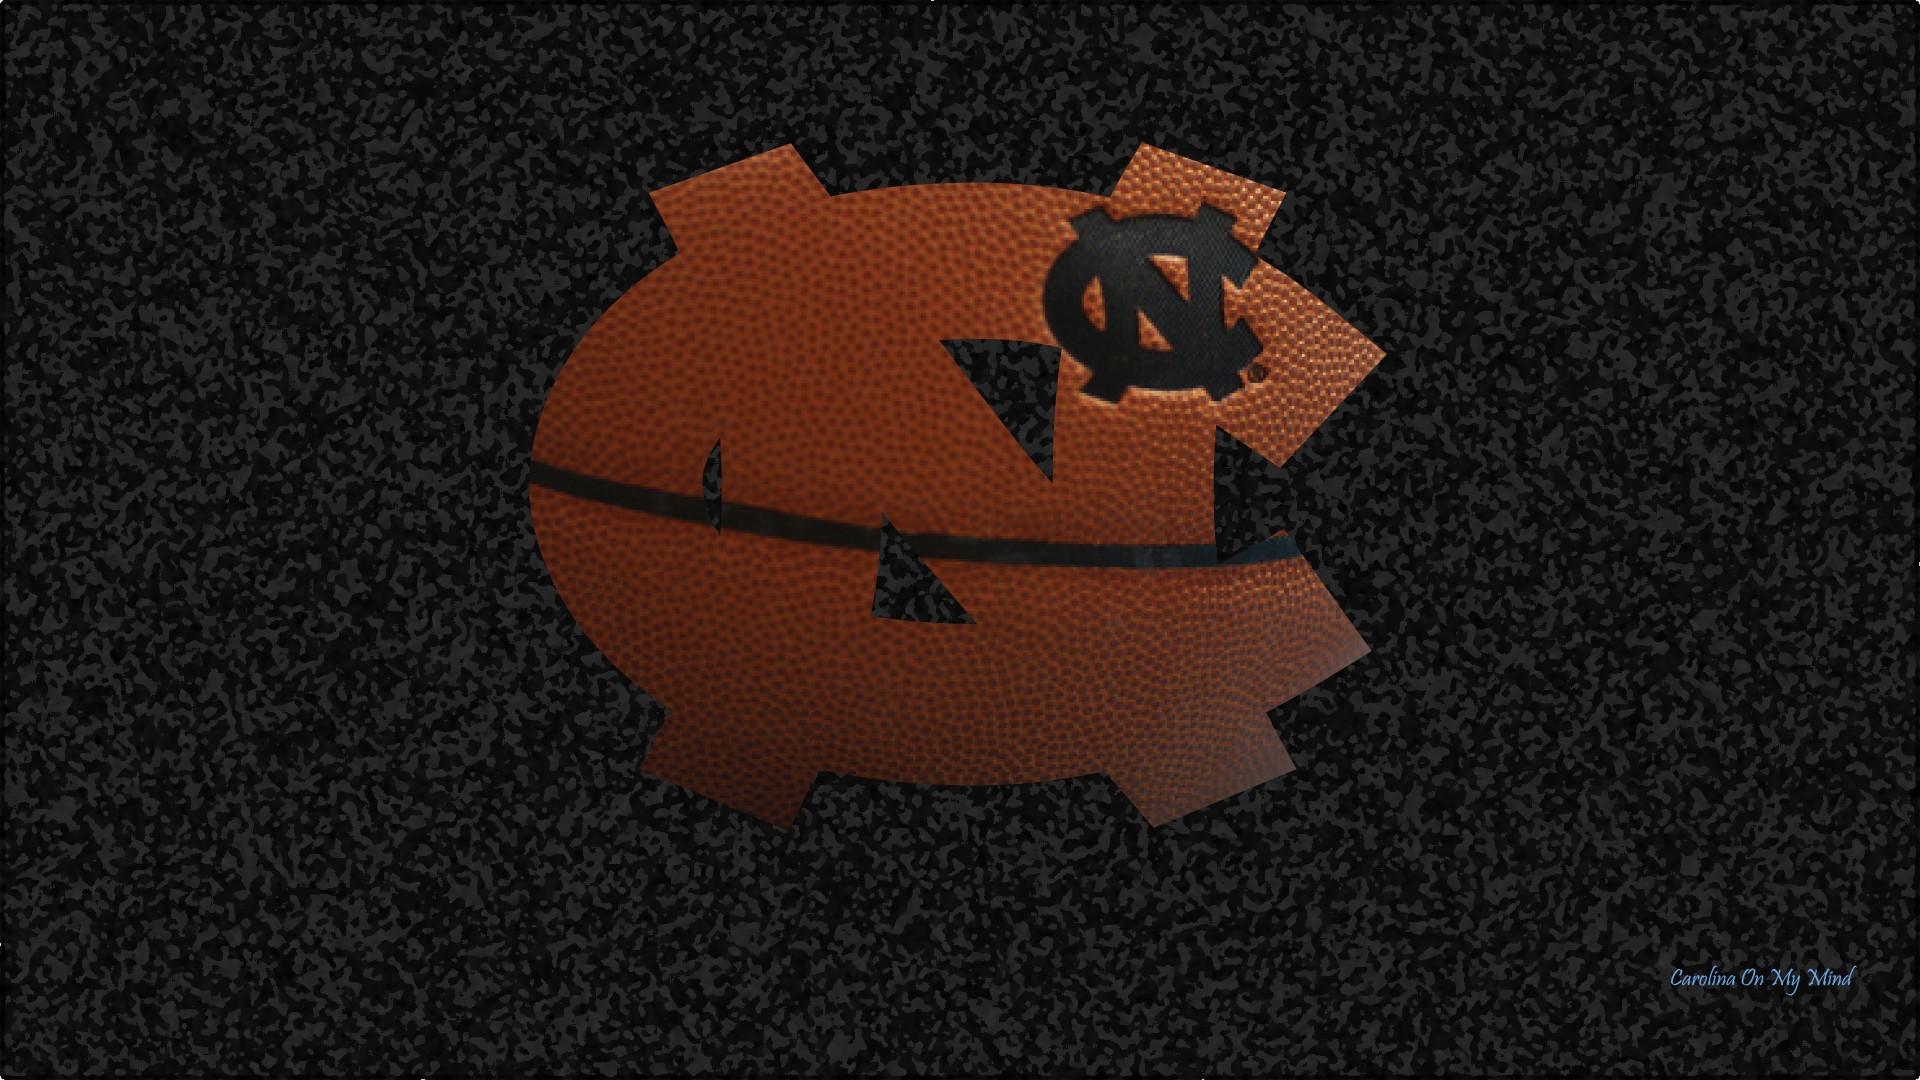 UNC Wallpaper   Basketball Grain NC Logo on Textured Black Background 1920x1080